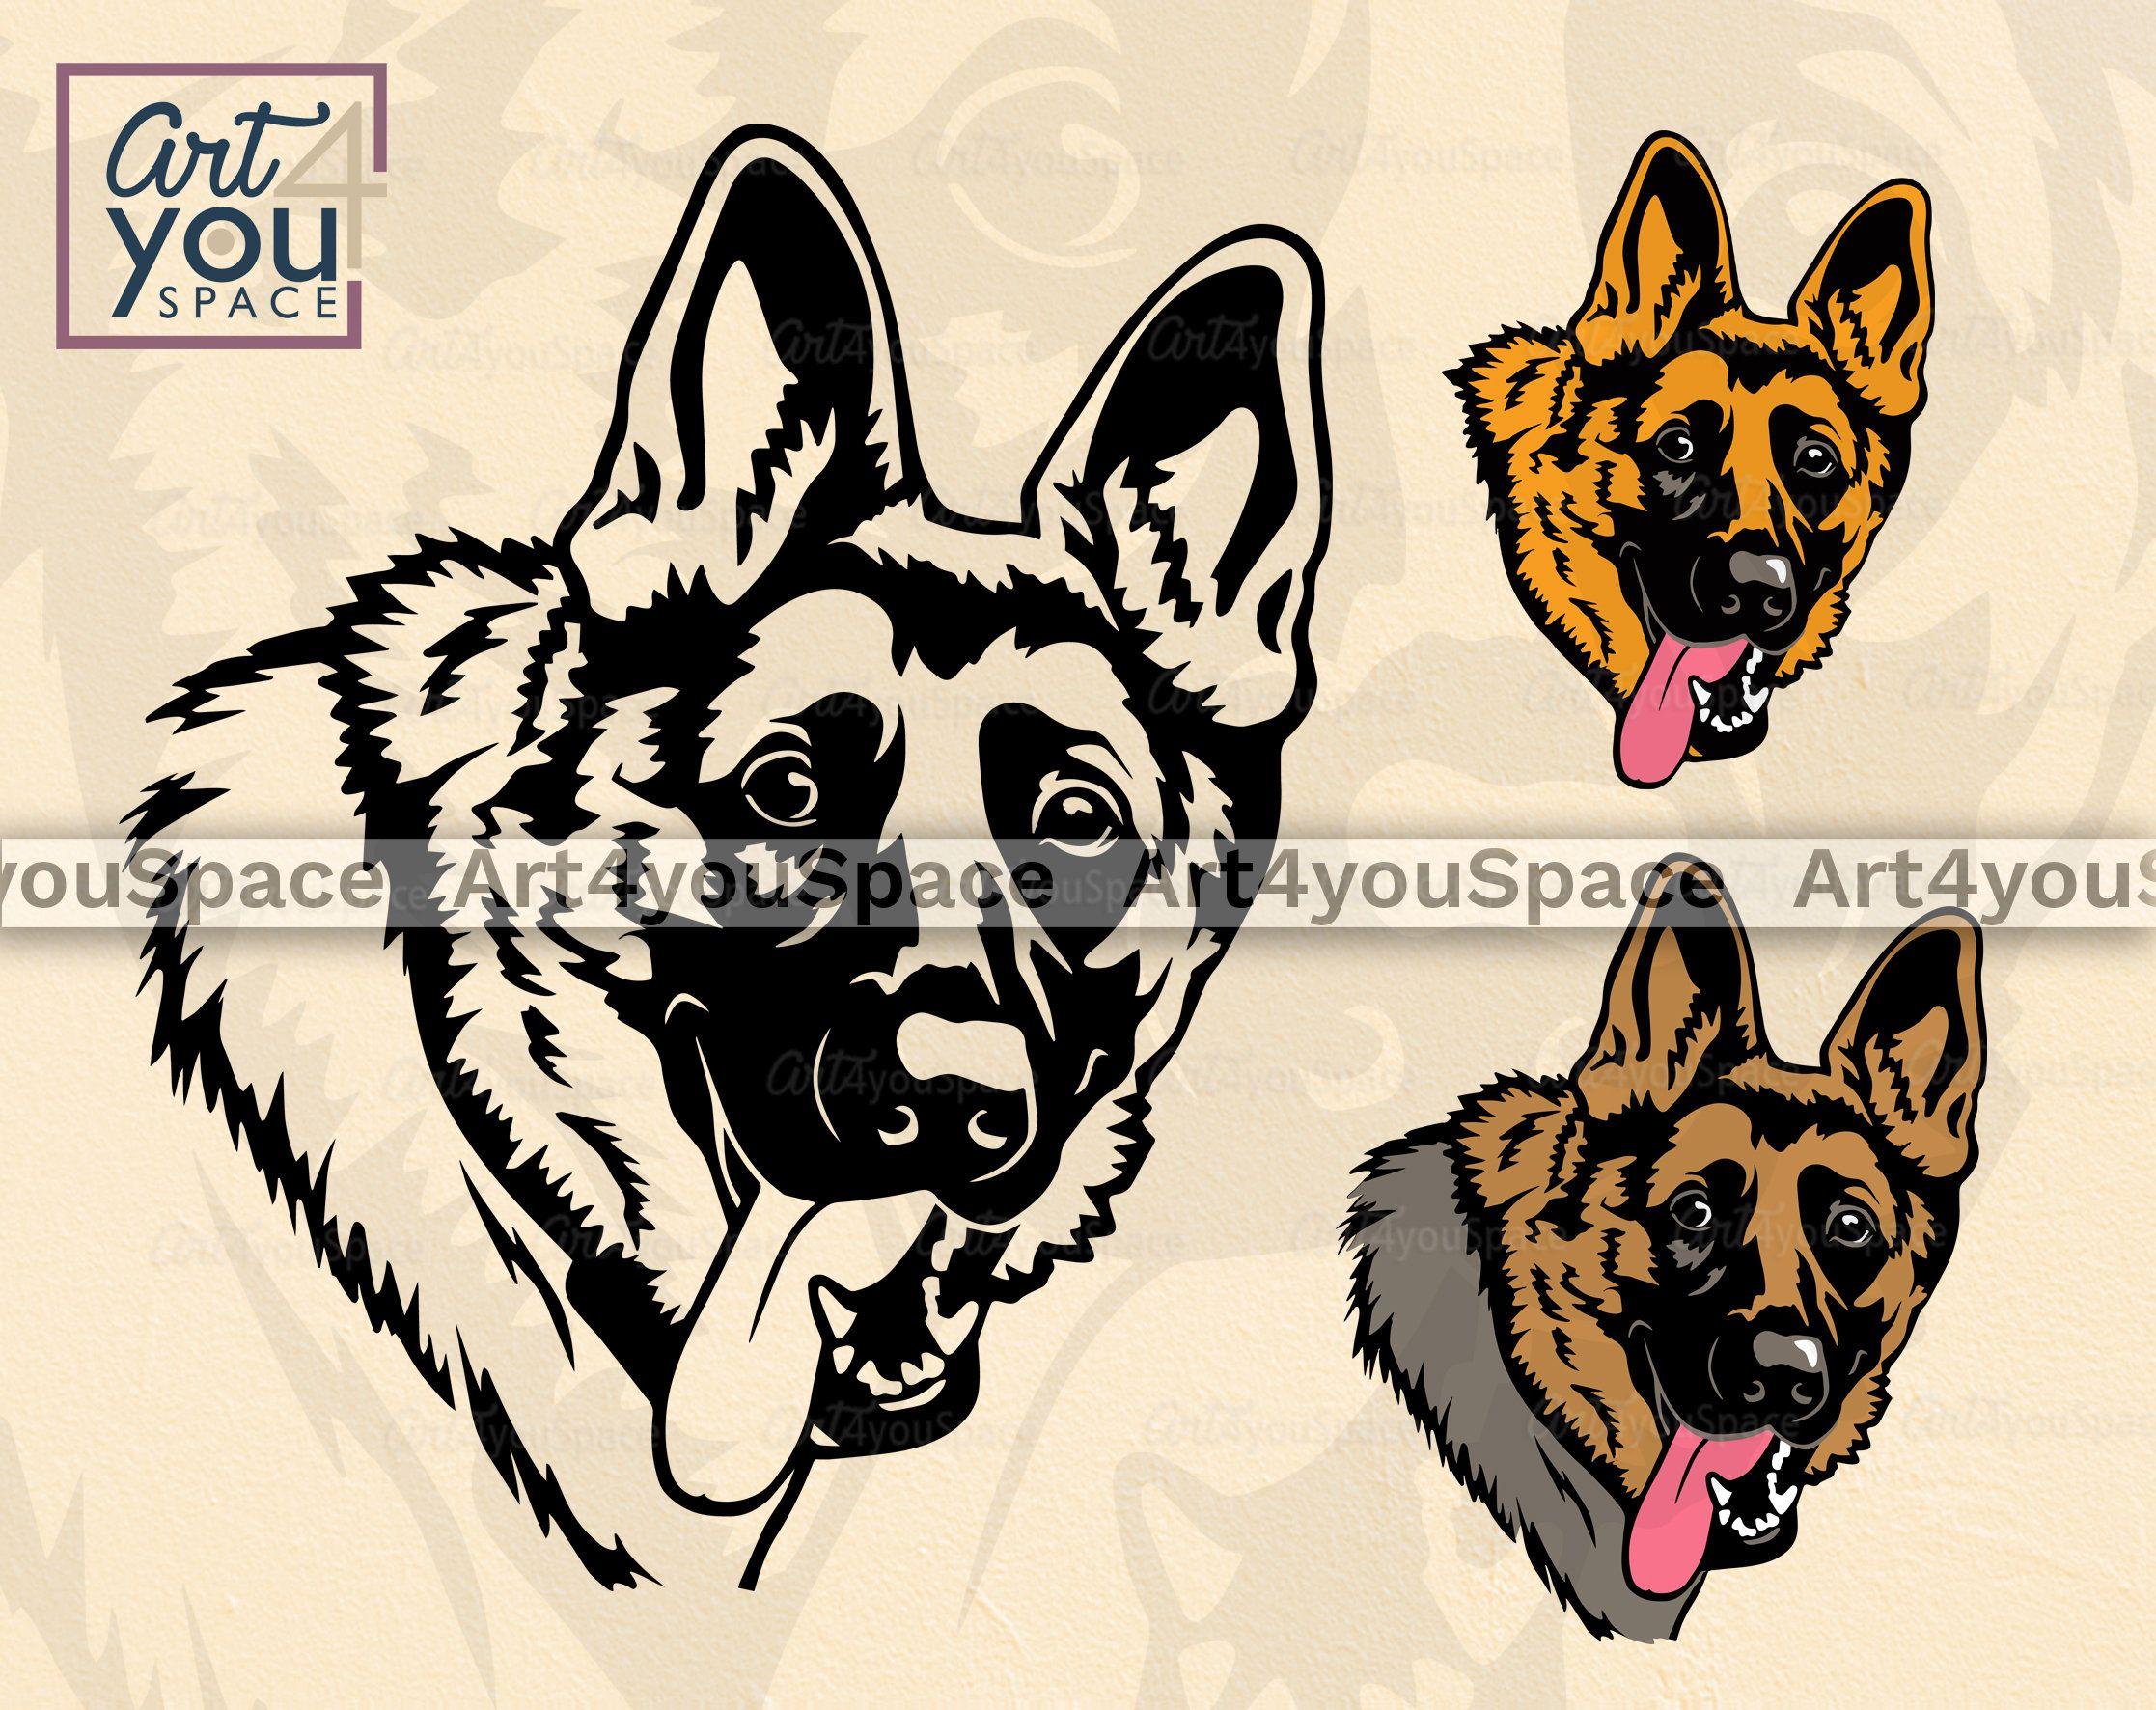 German Shepherd Line Art Image Transparent Png German Shepherd Dogs Dog Design Line Art Images